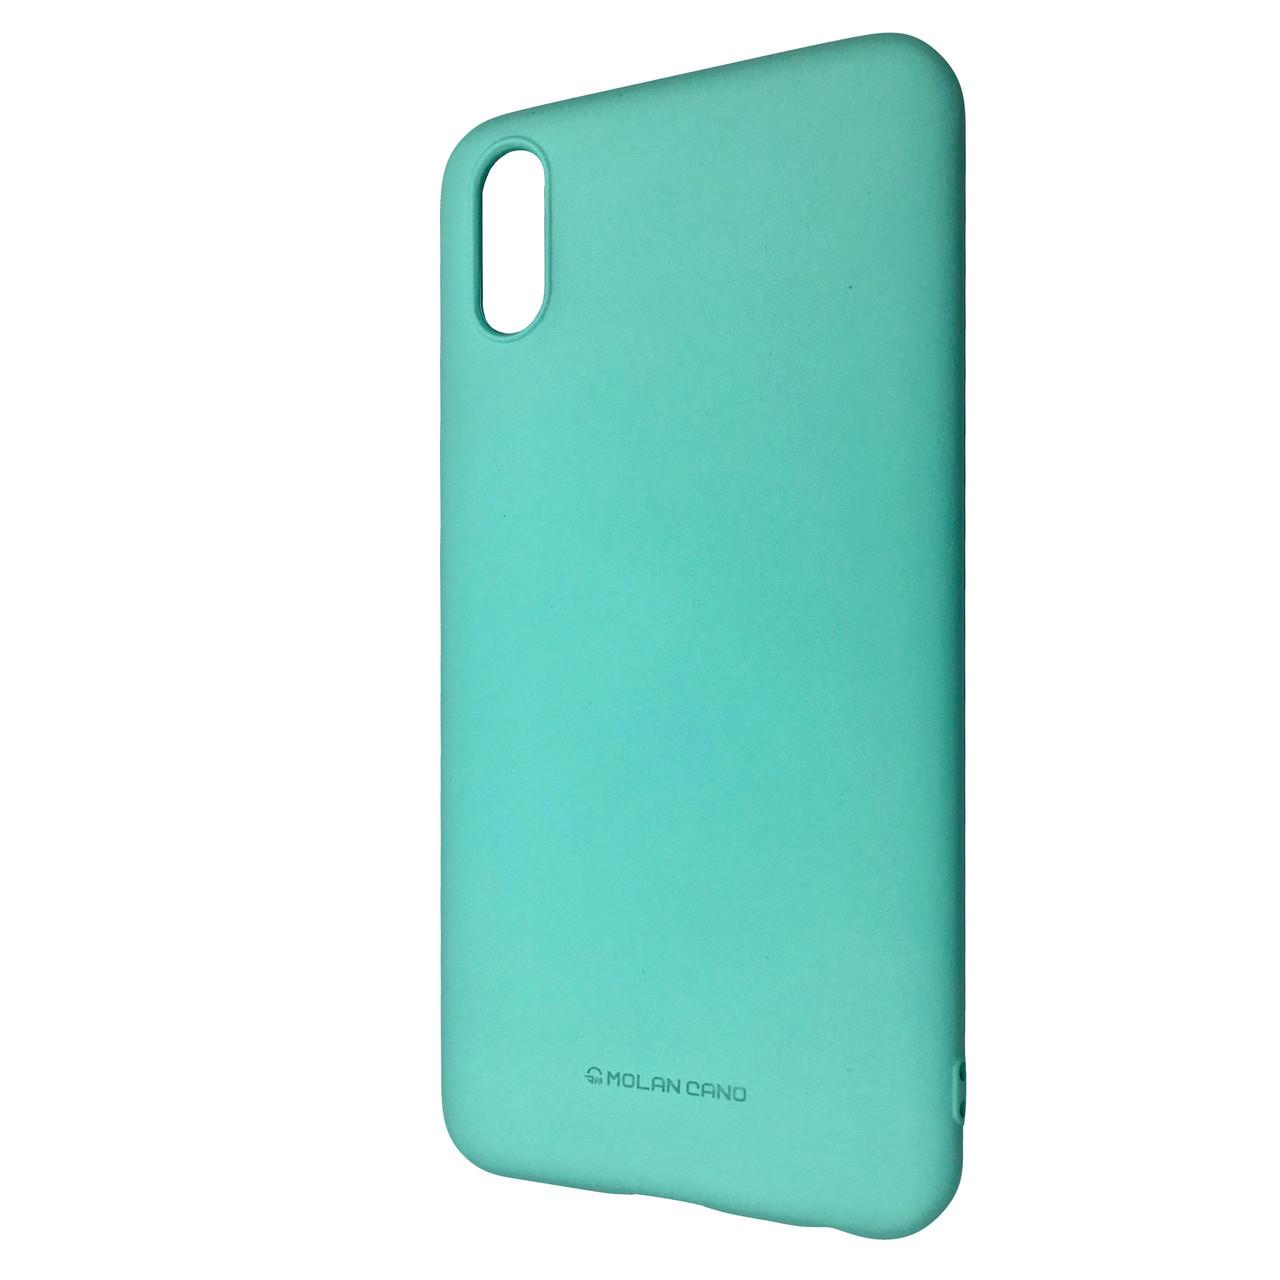 Чехол Silicone Hana Molan Cano Xiaomi Redmi 7A (mint)